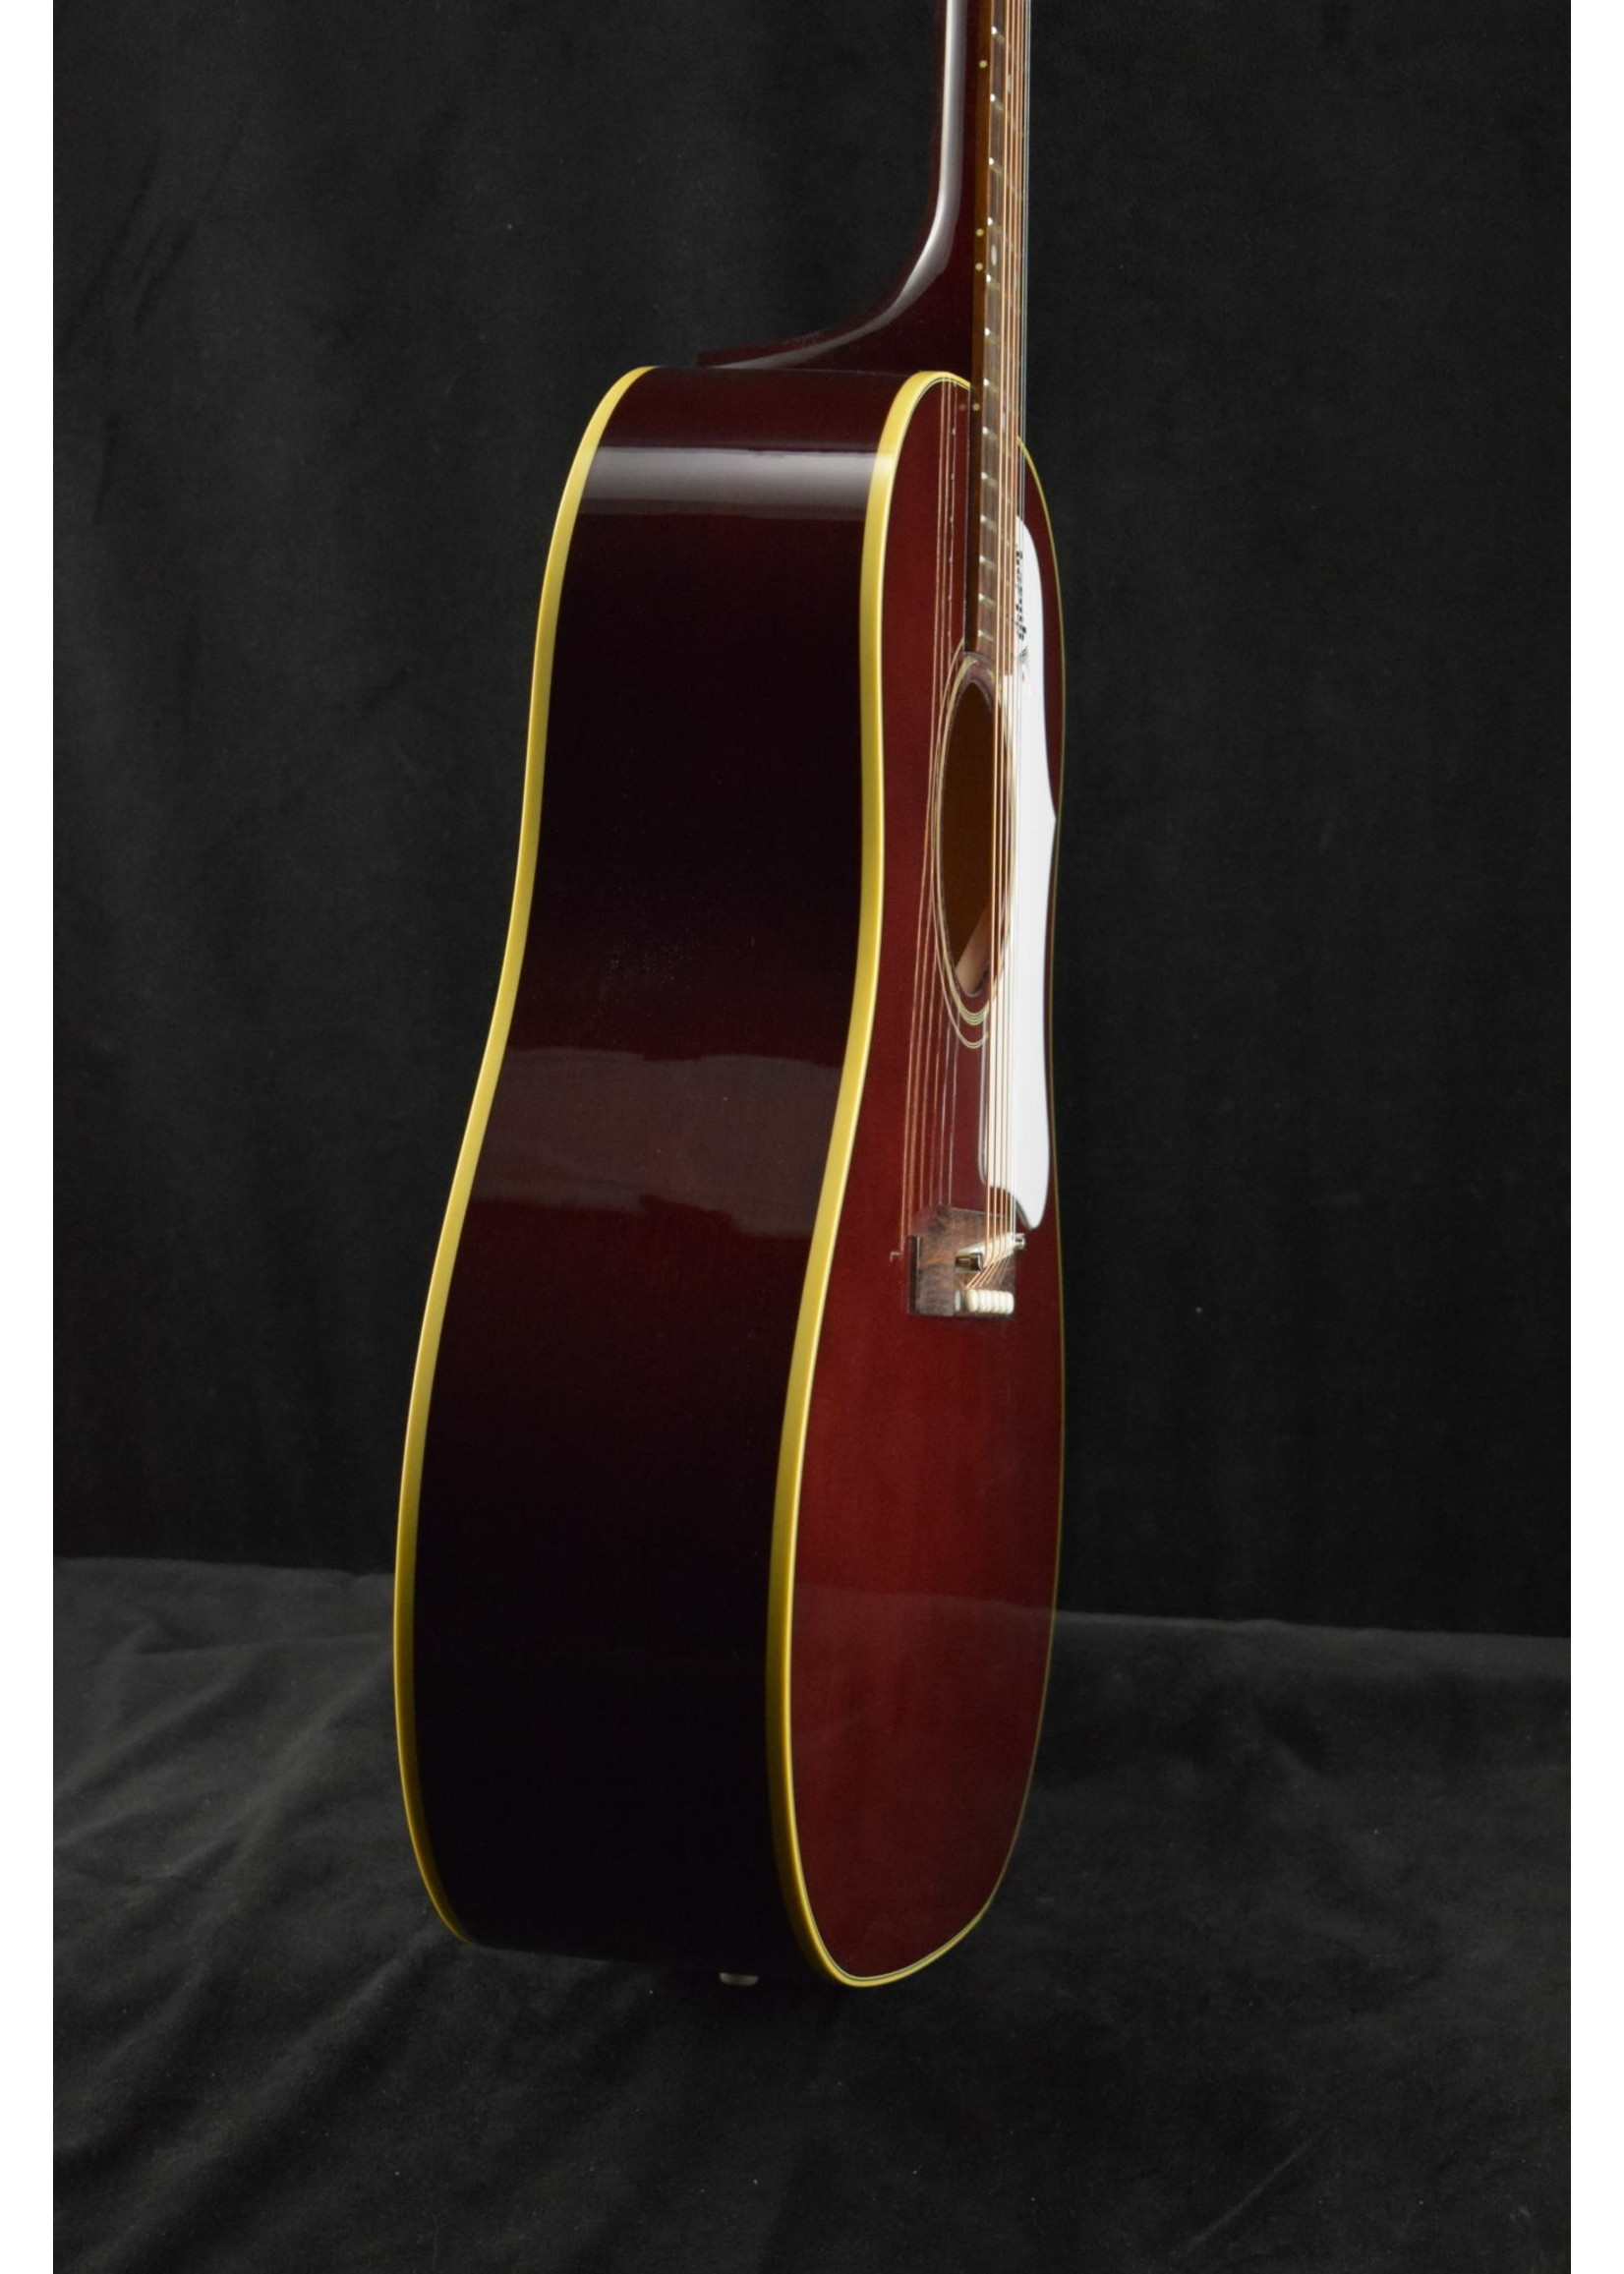 Gibson Gibson 60s J-45 Original Adjustable Saddle (No Pickup) Wine Red